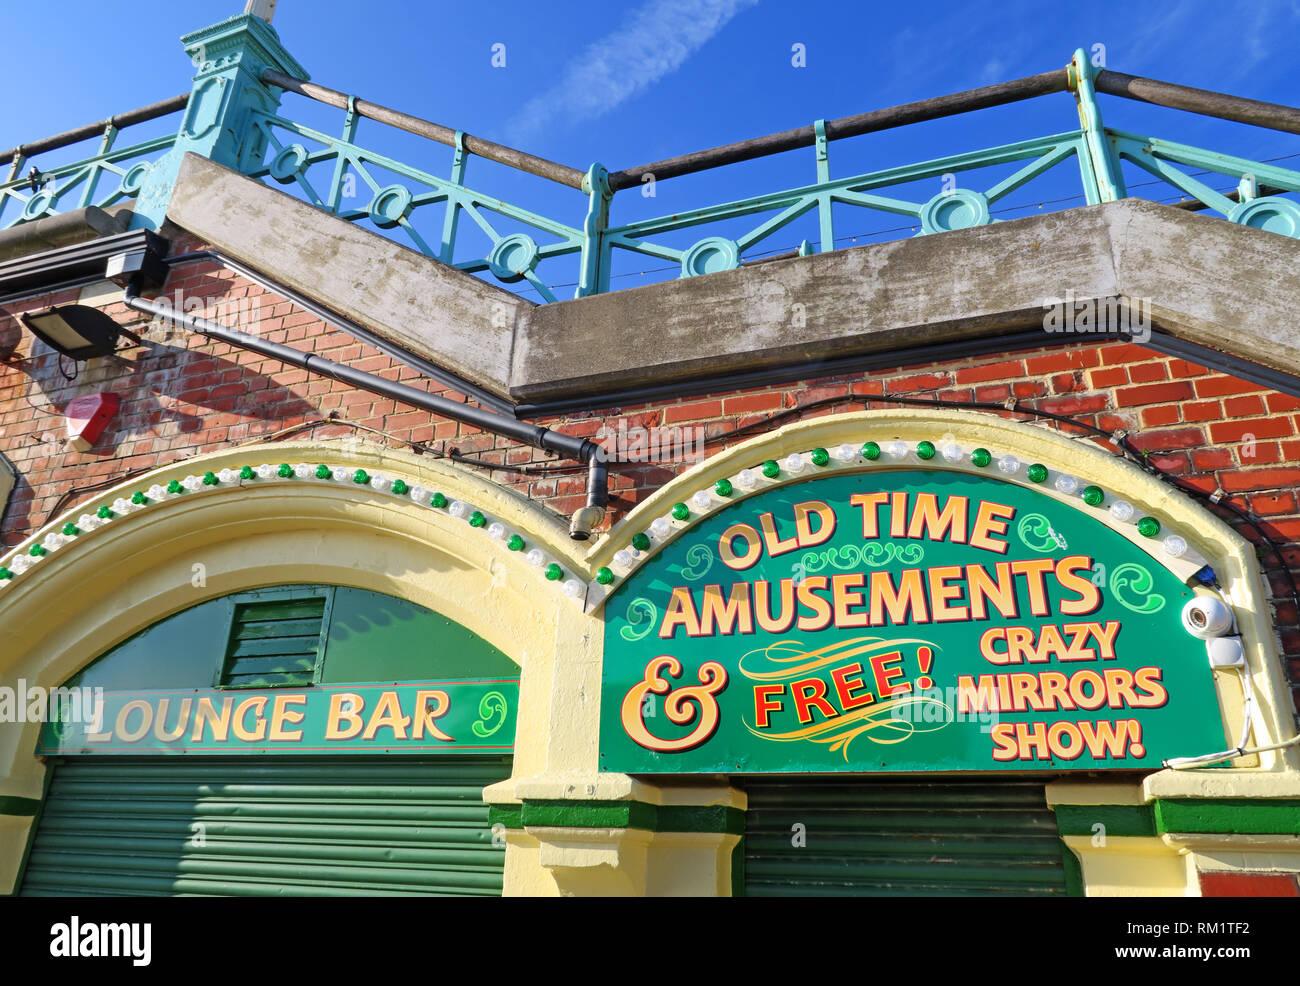 GoTonySmith,HotpixUK,@HotpixUK,England,UK,Brighton,East Sussex,Brighton and Hove City Council,city centre,shore,South East England,City,city,Kings Road Arches,Beachfront,Lounge,Bar,Old Time,amusements,Free,Mirrors,English Seaside,British seaside,sign,English pub,English Bar,Brighton bar,Brighton Lounge Bar